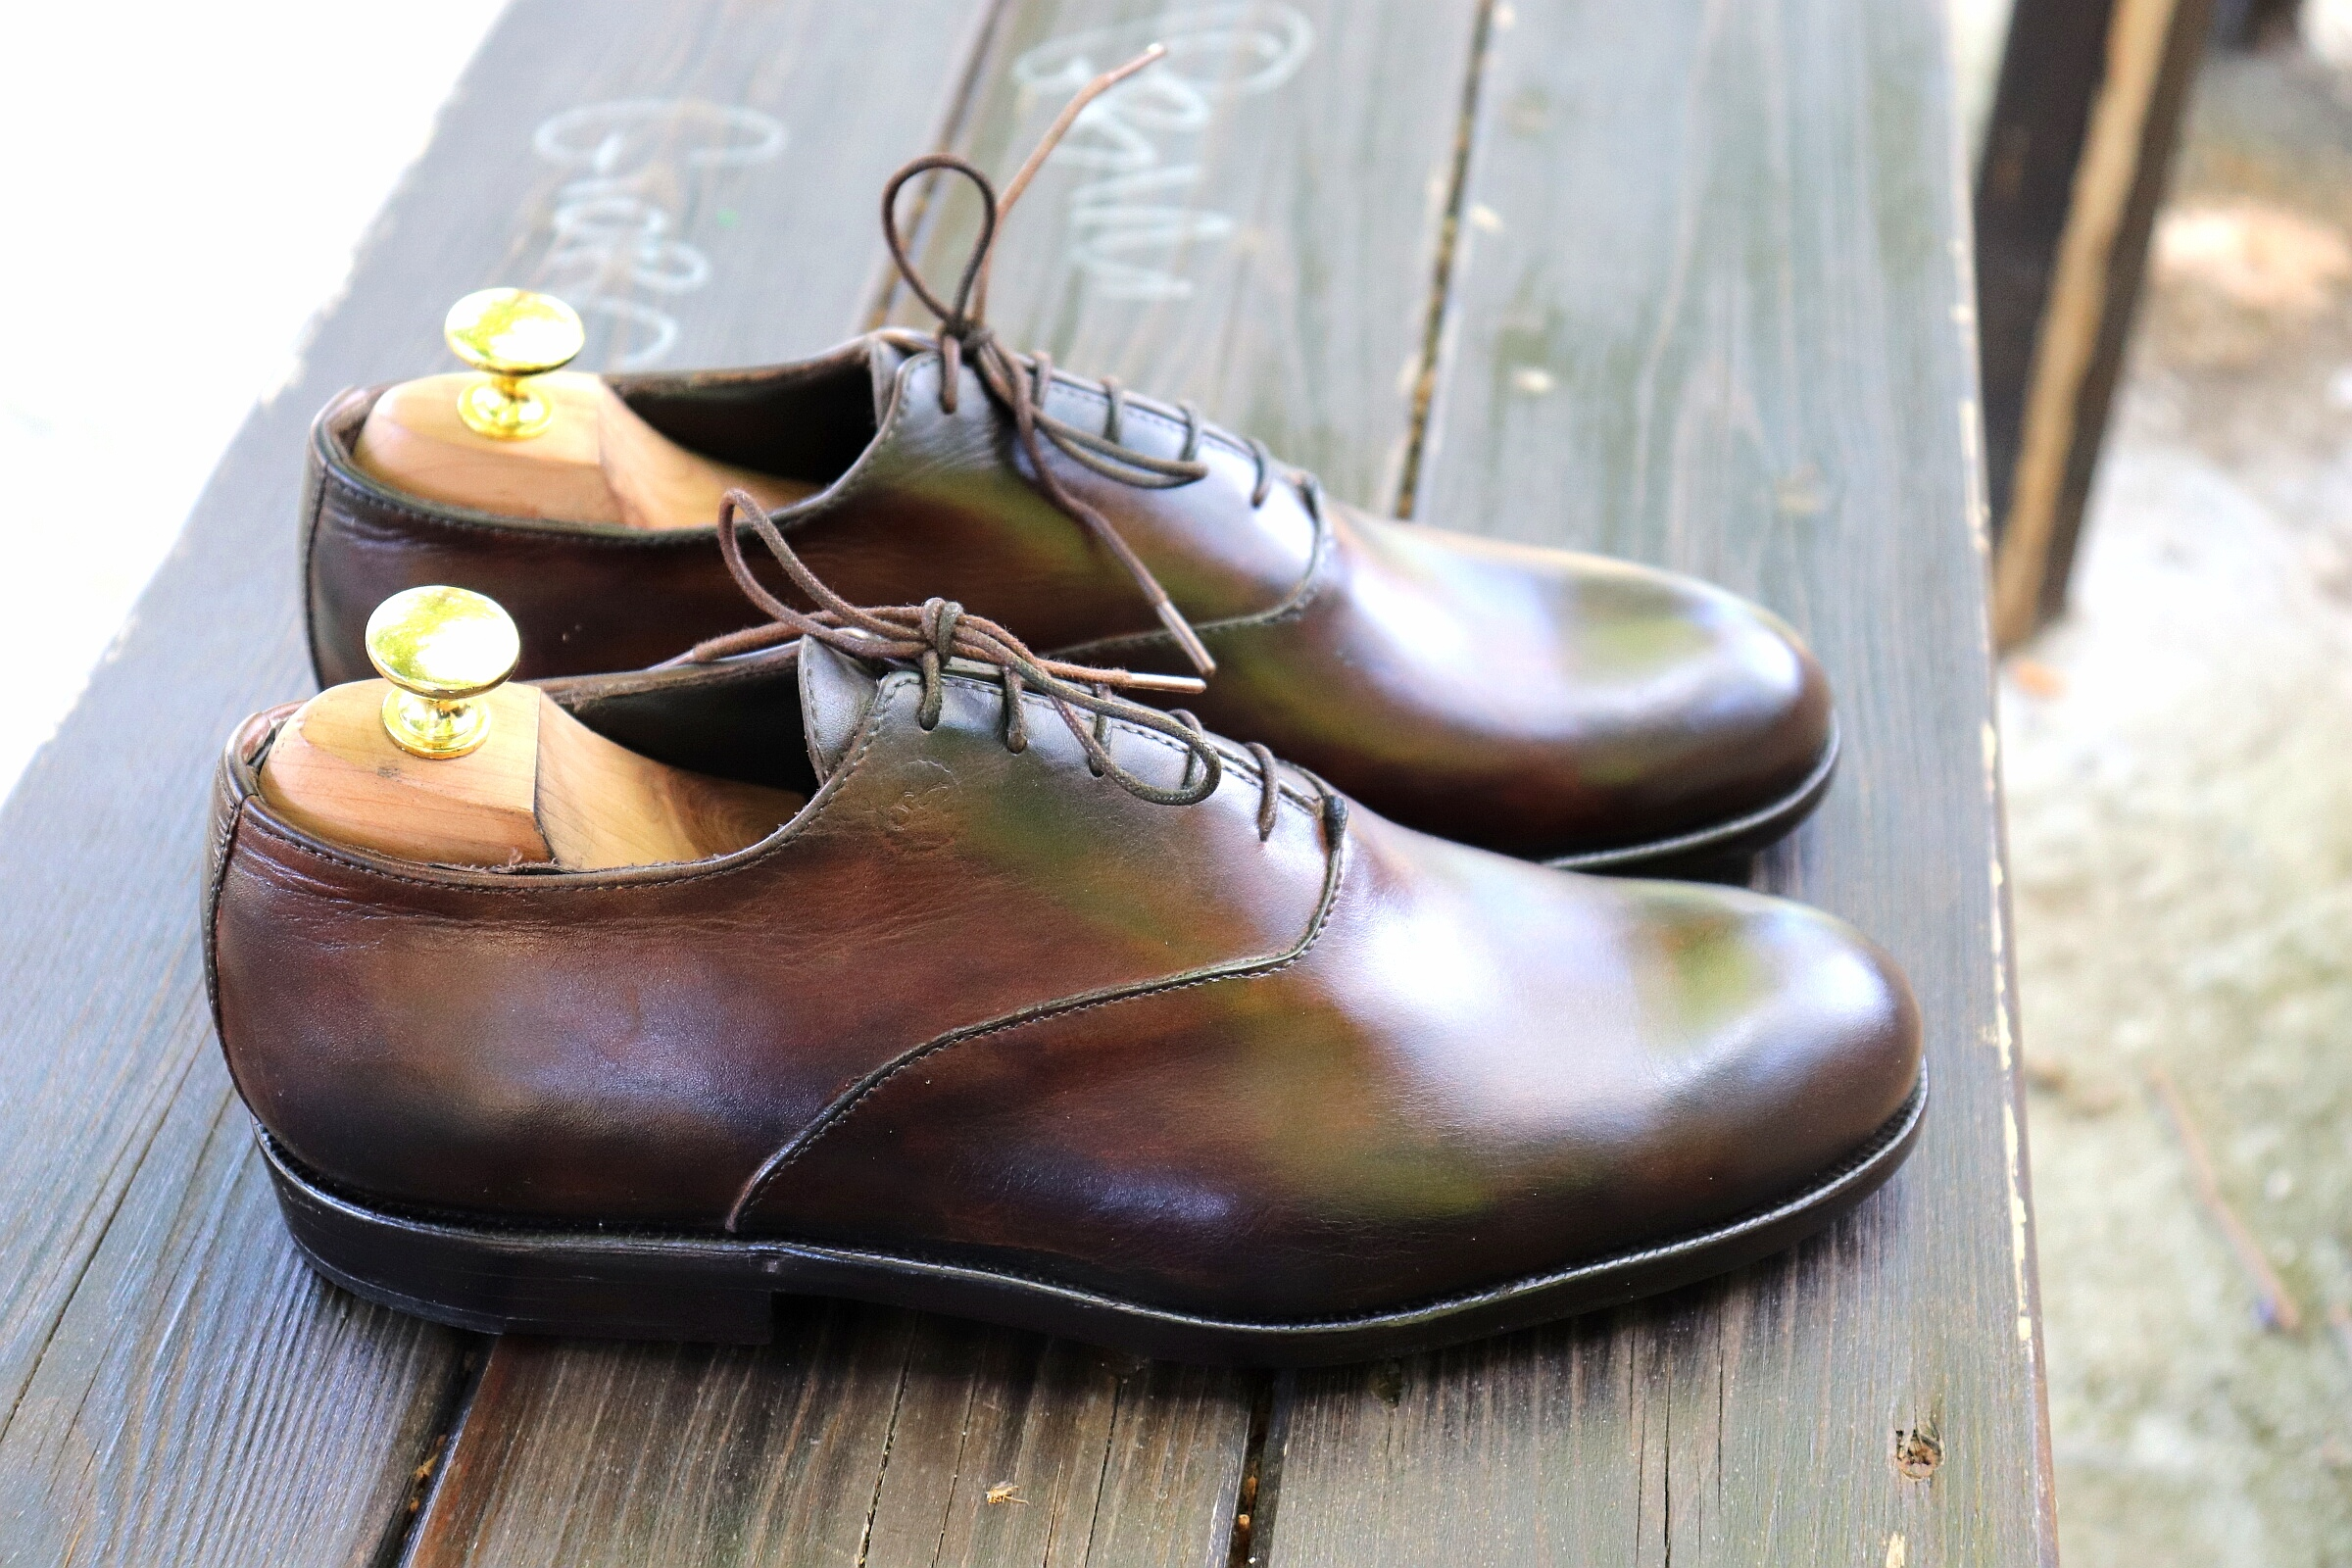 stefano-reda-shoemakers-rende-cosenza-thumbnail